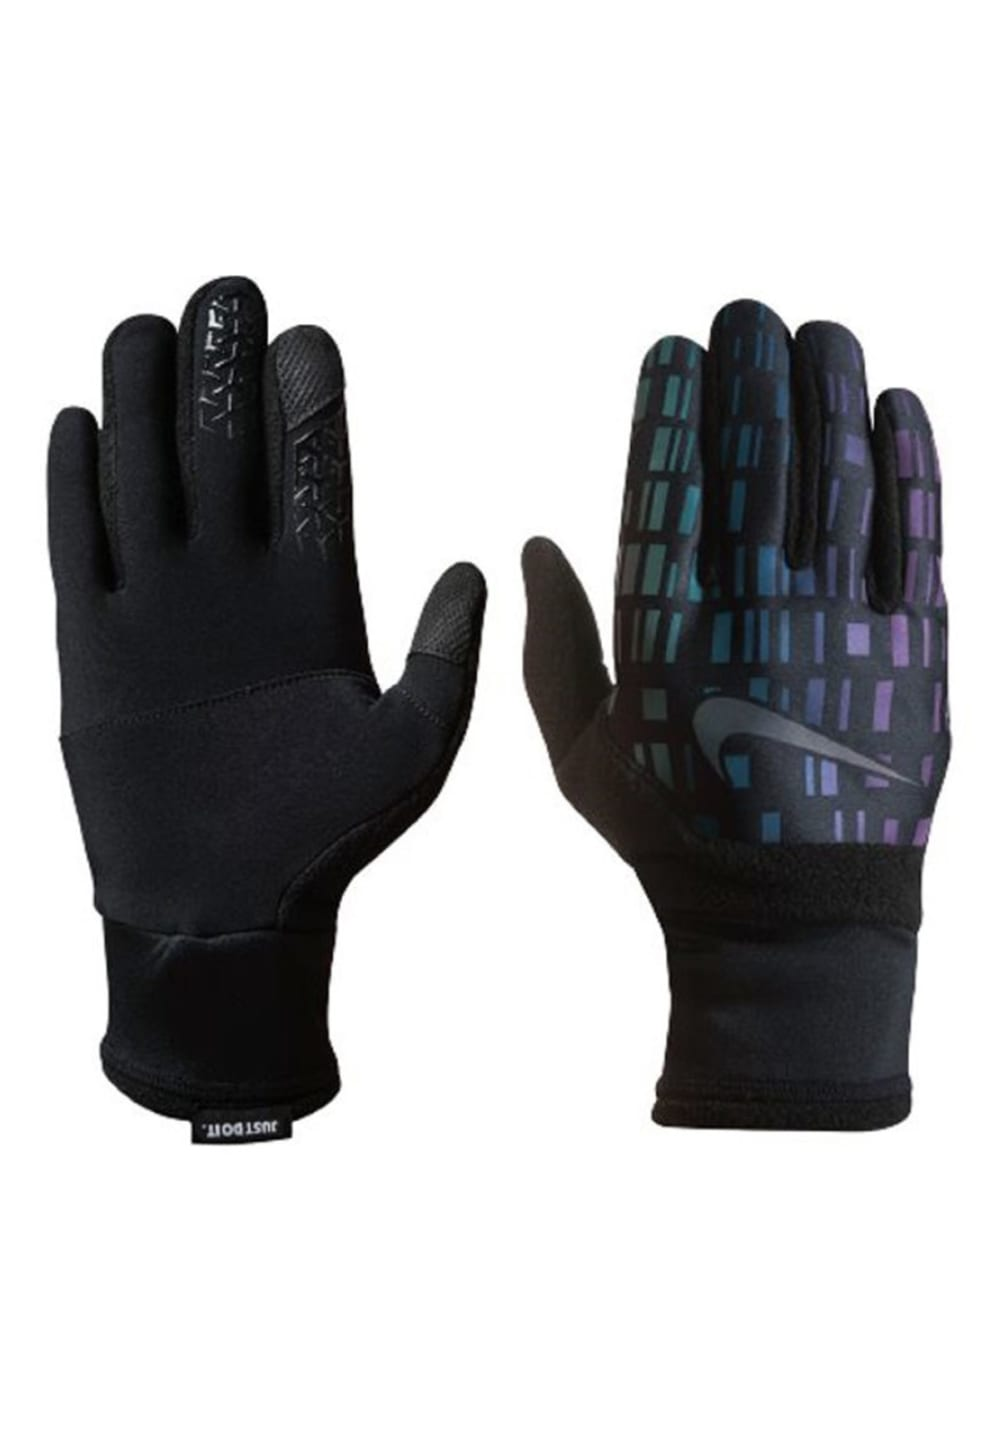 Nike Vapor Flash Run Gloves 3.0 - Running gloves for Women - Black ... 1eaa5f8a8